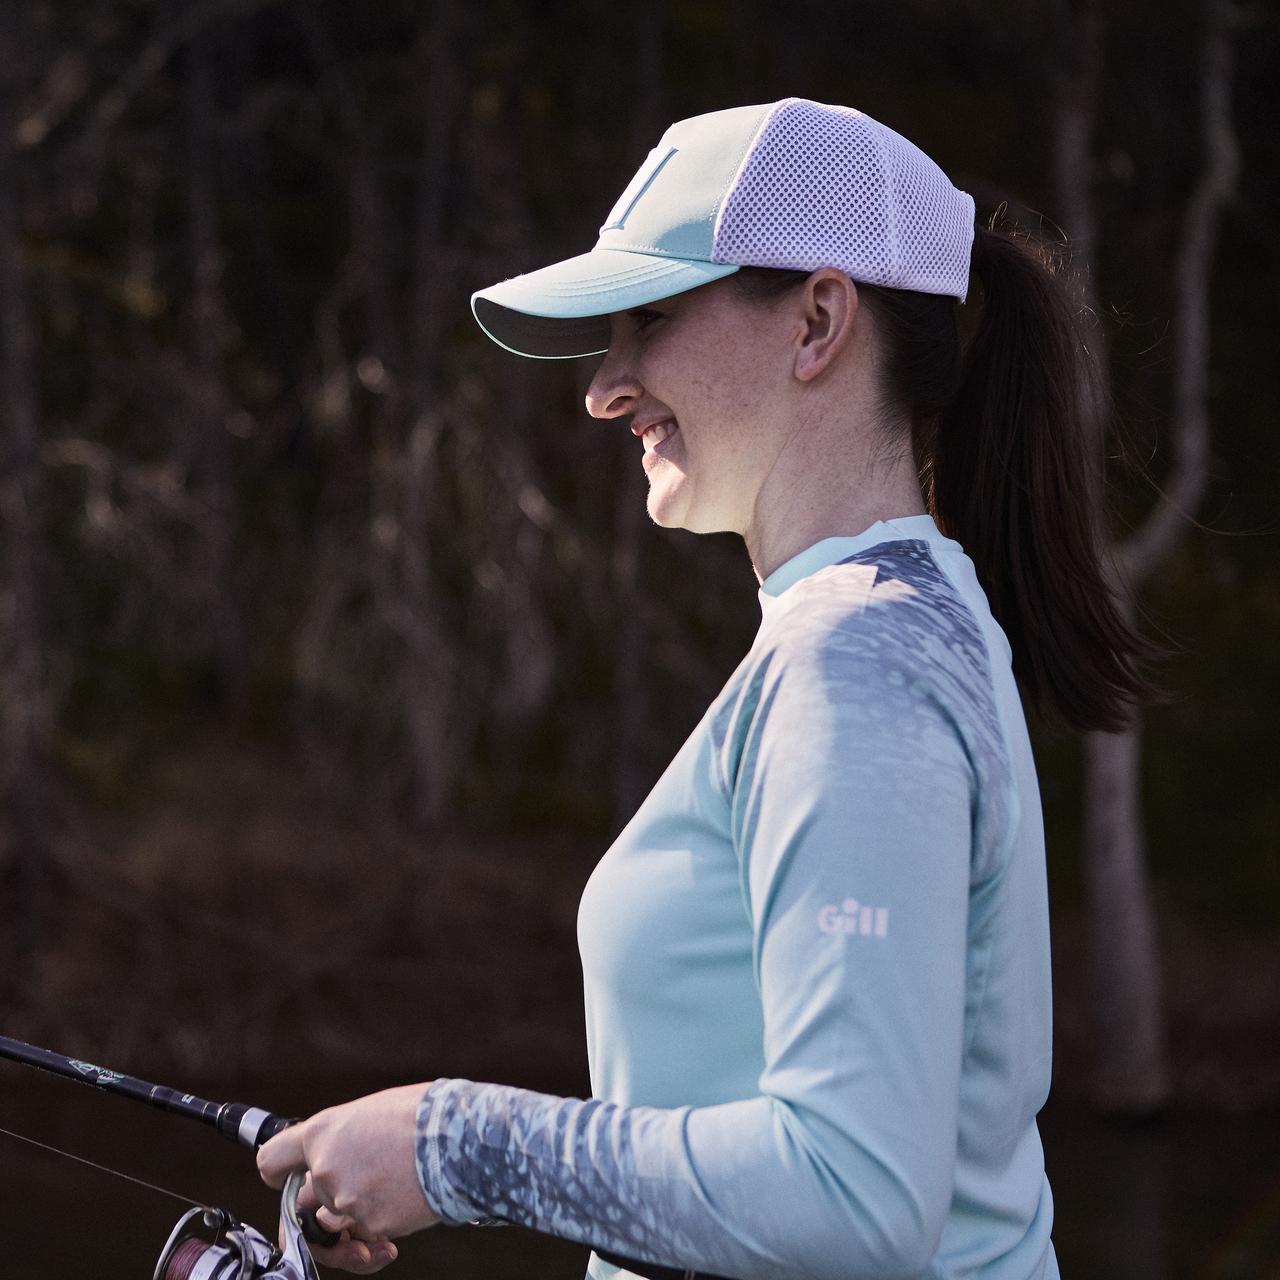 Women's UV Tec Tee - Long Sleeve - UV011W-MOR01-LIFESTYLE-2.jpg